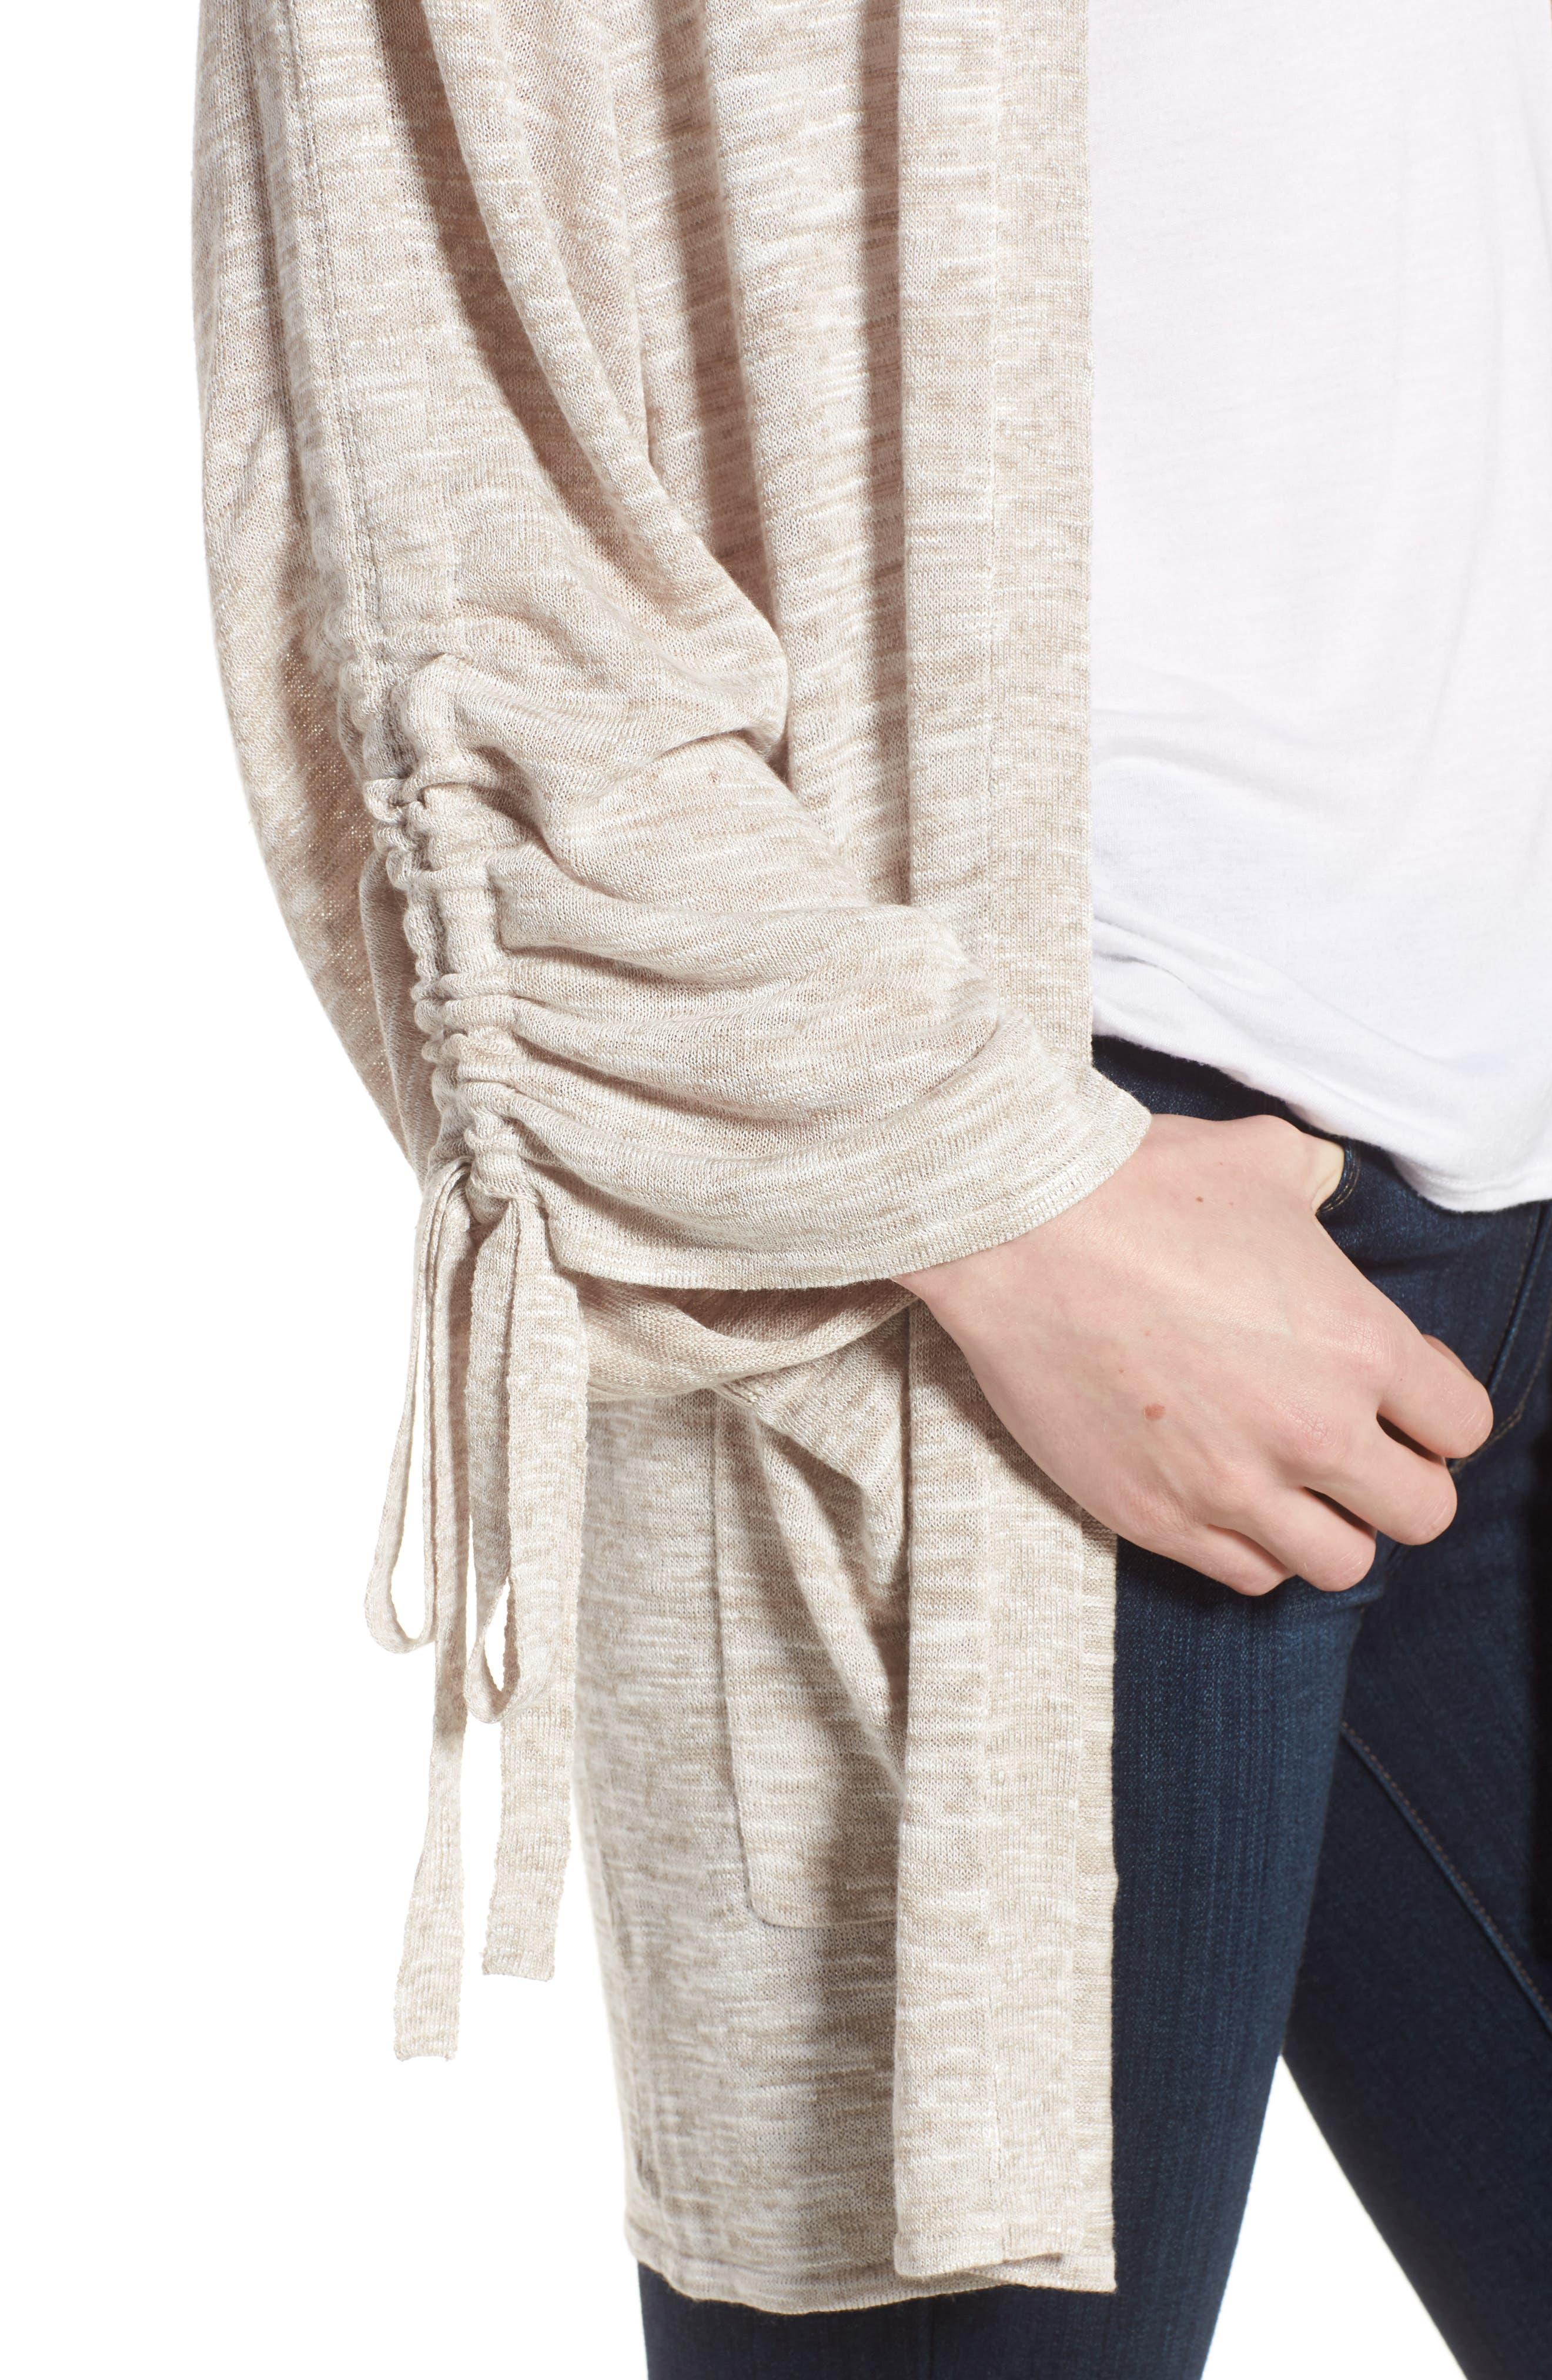 Ruched Sleeve Cardigan,                             Alternate thumbnail 4, color,                             Beige Linen- White Slubs